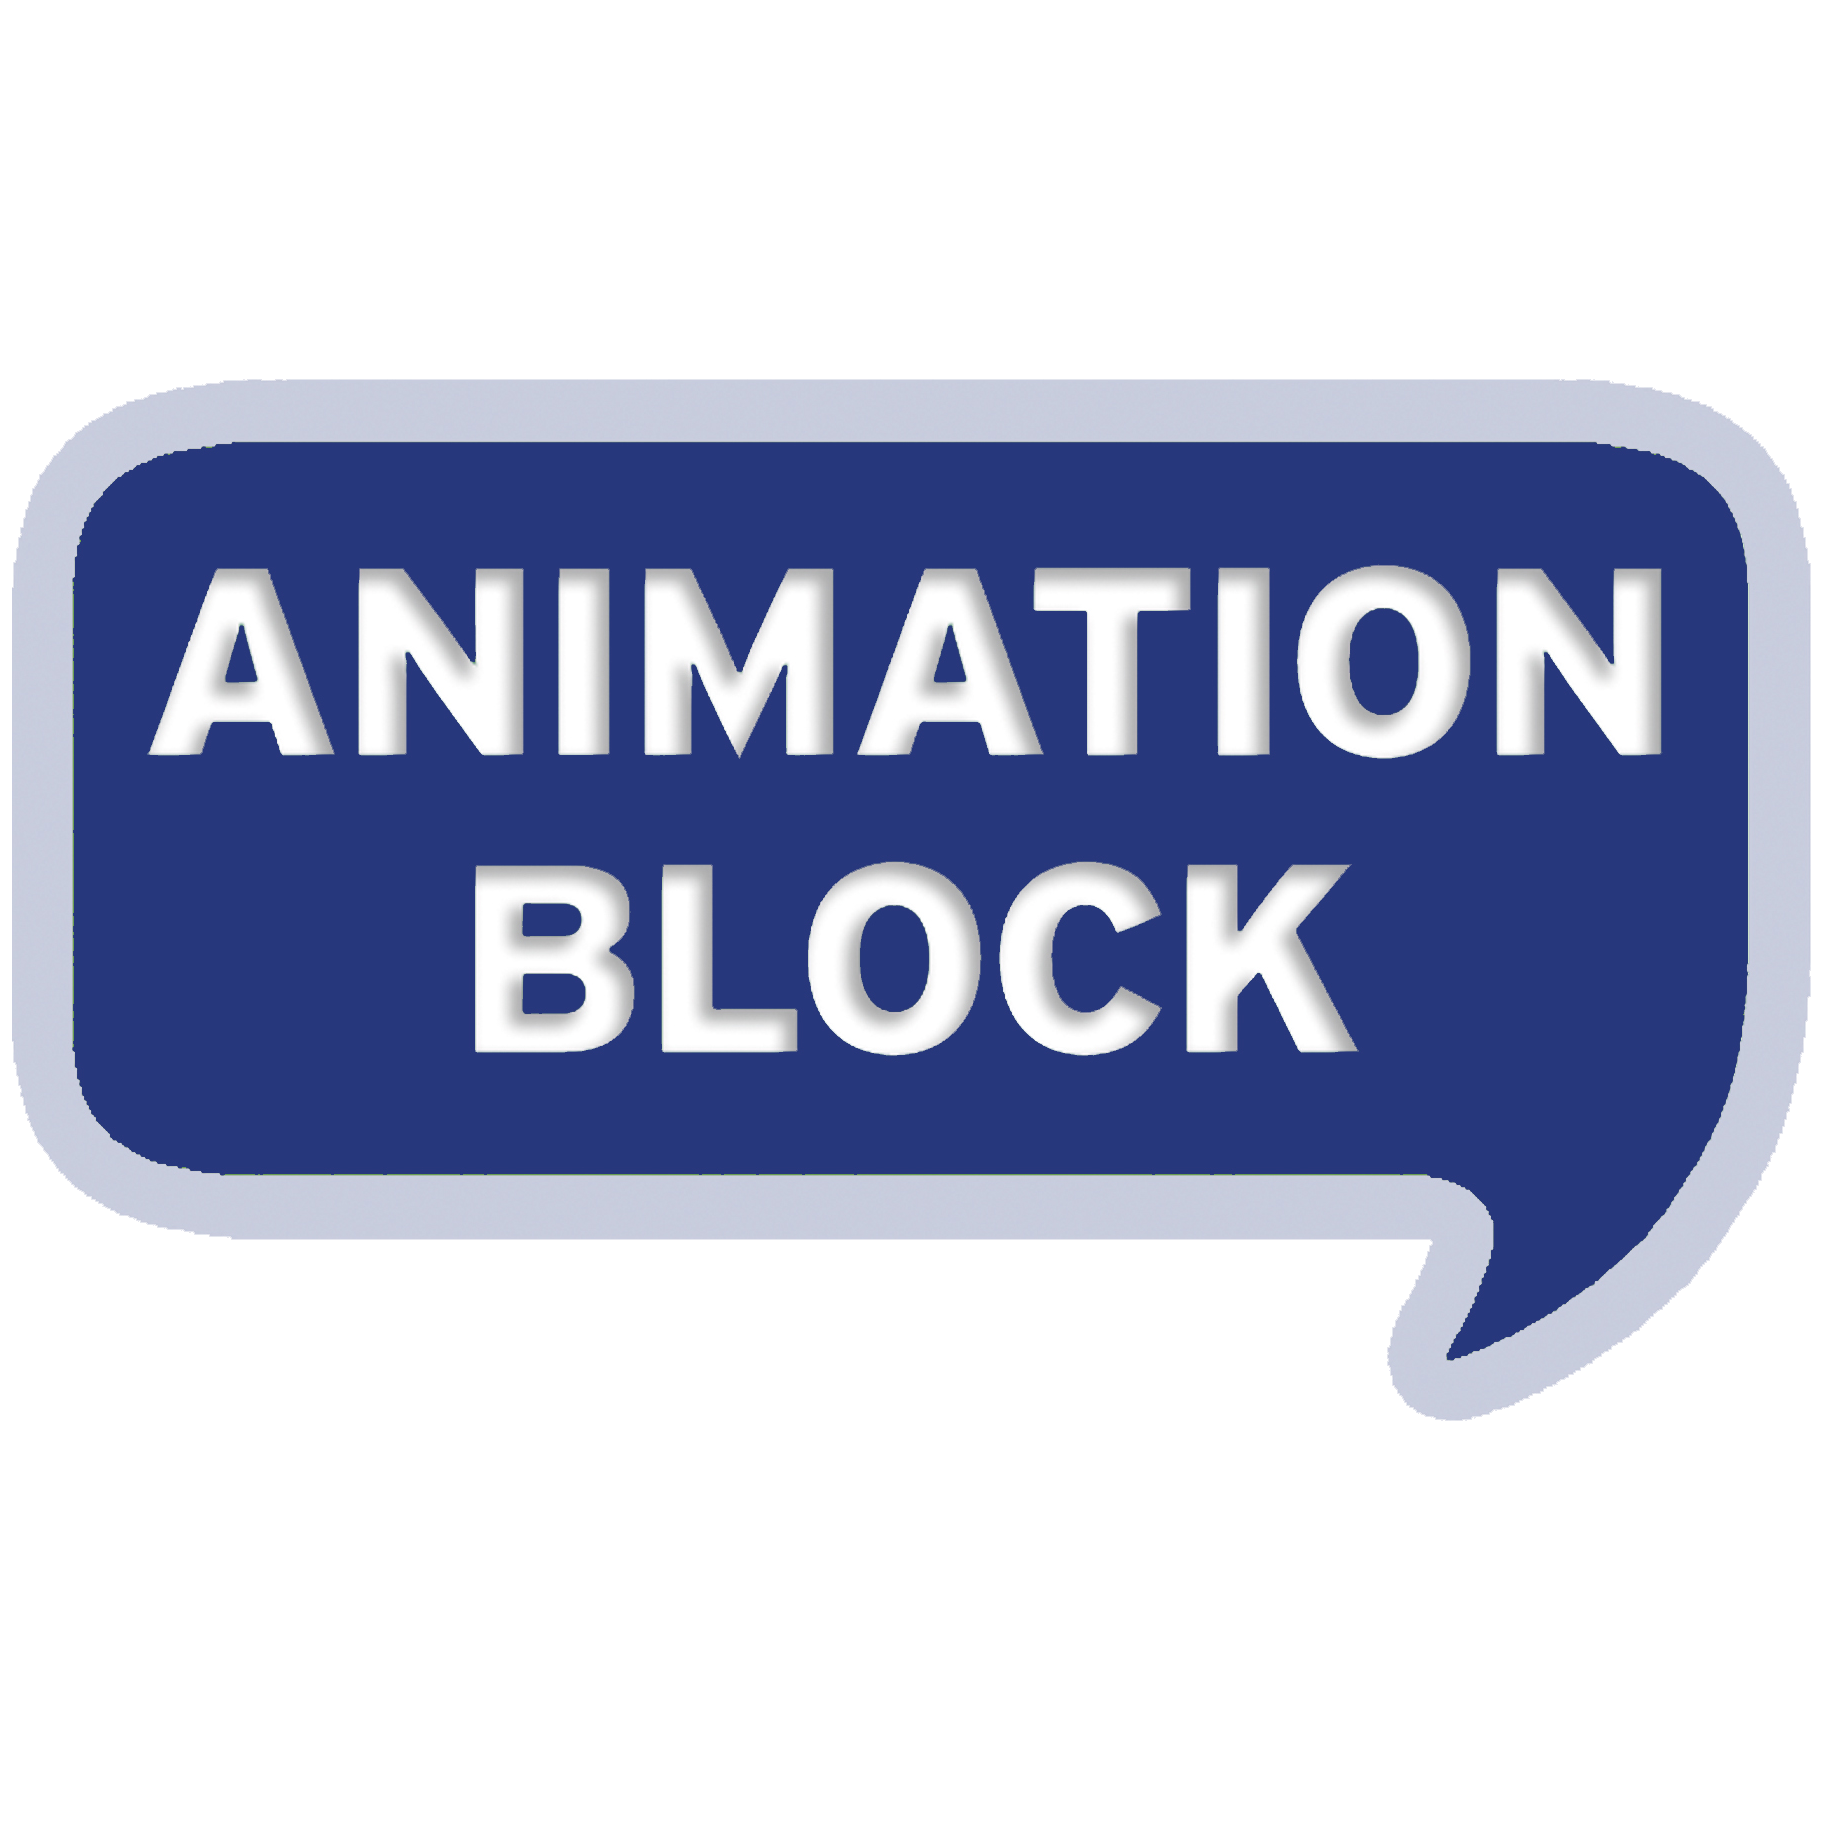 Animation Block